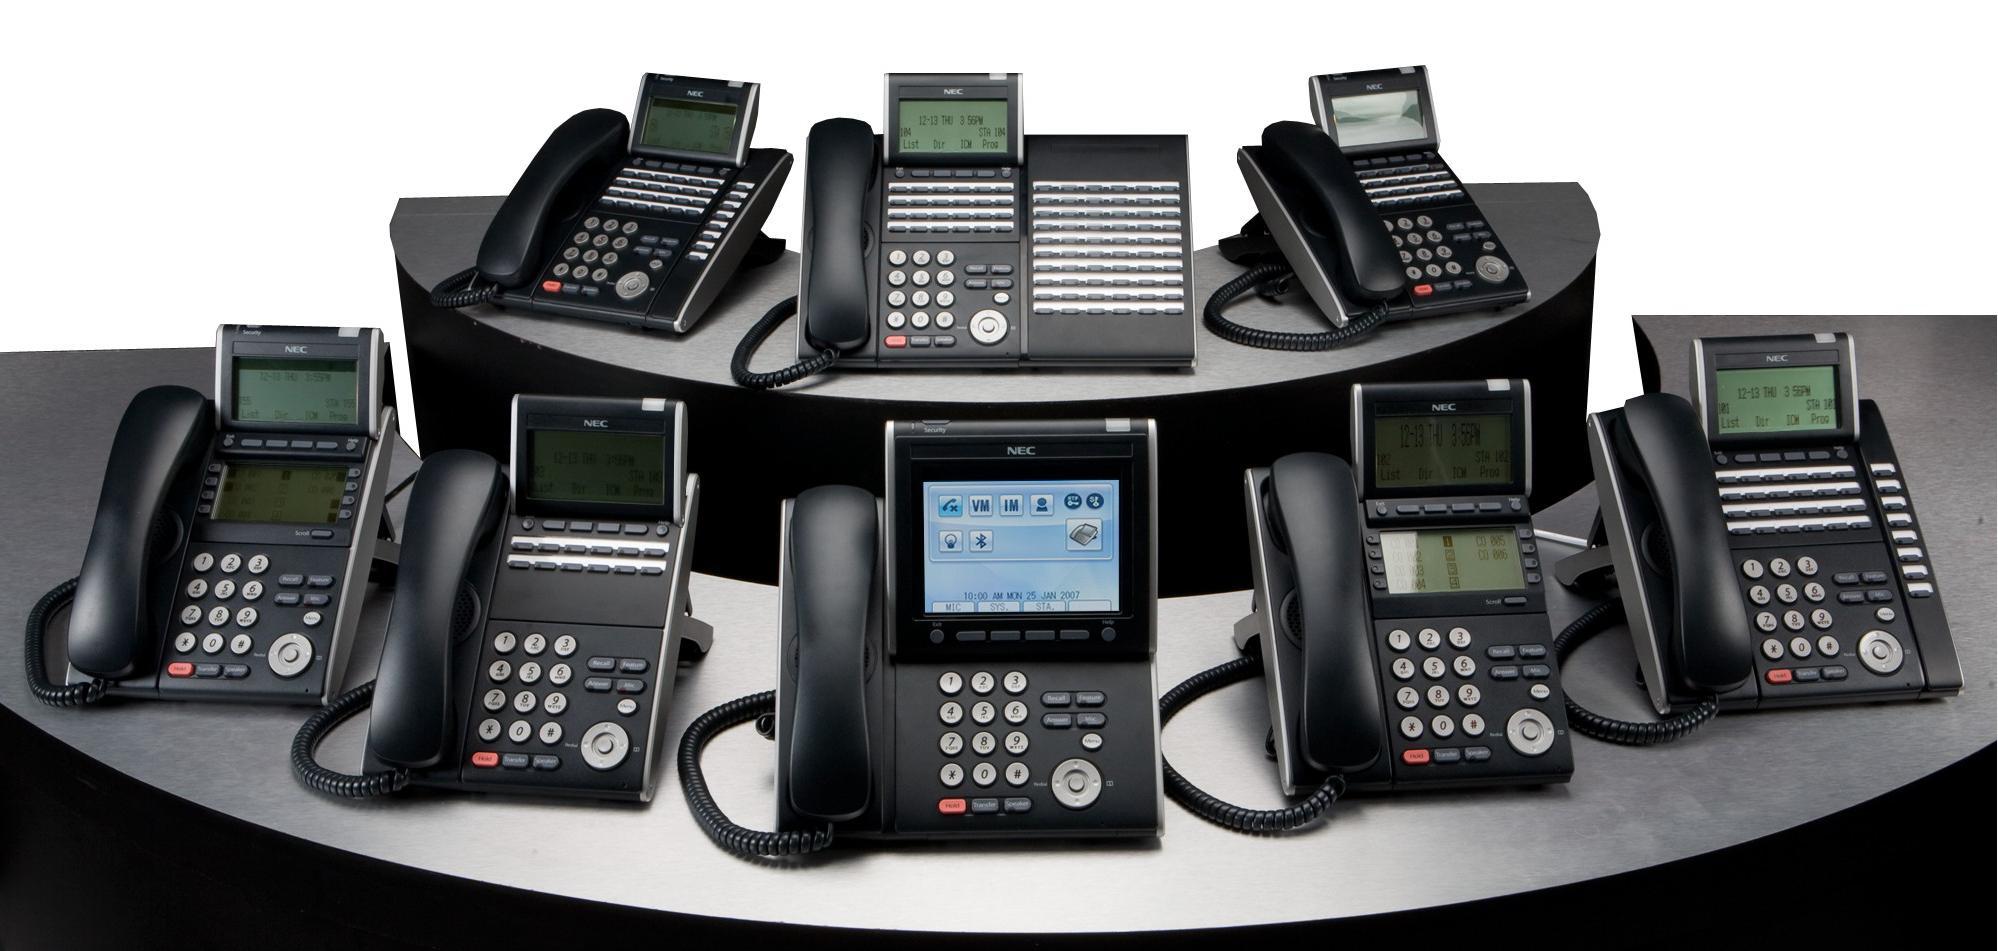 nec sv8100 handset options - NEC SV8100